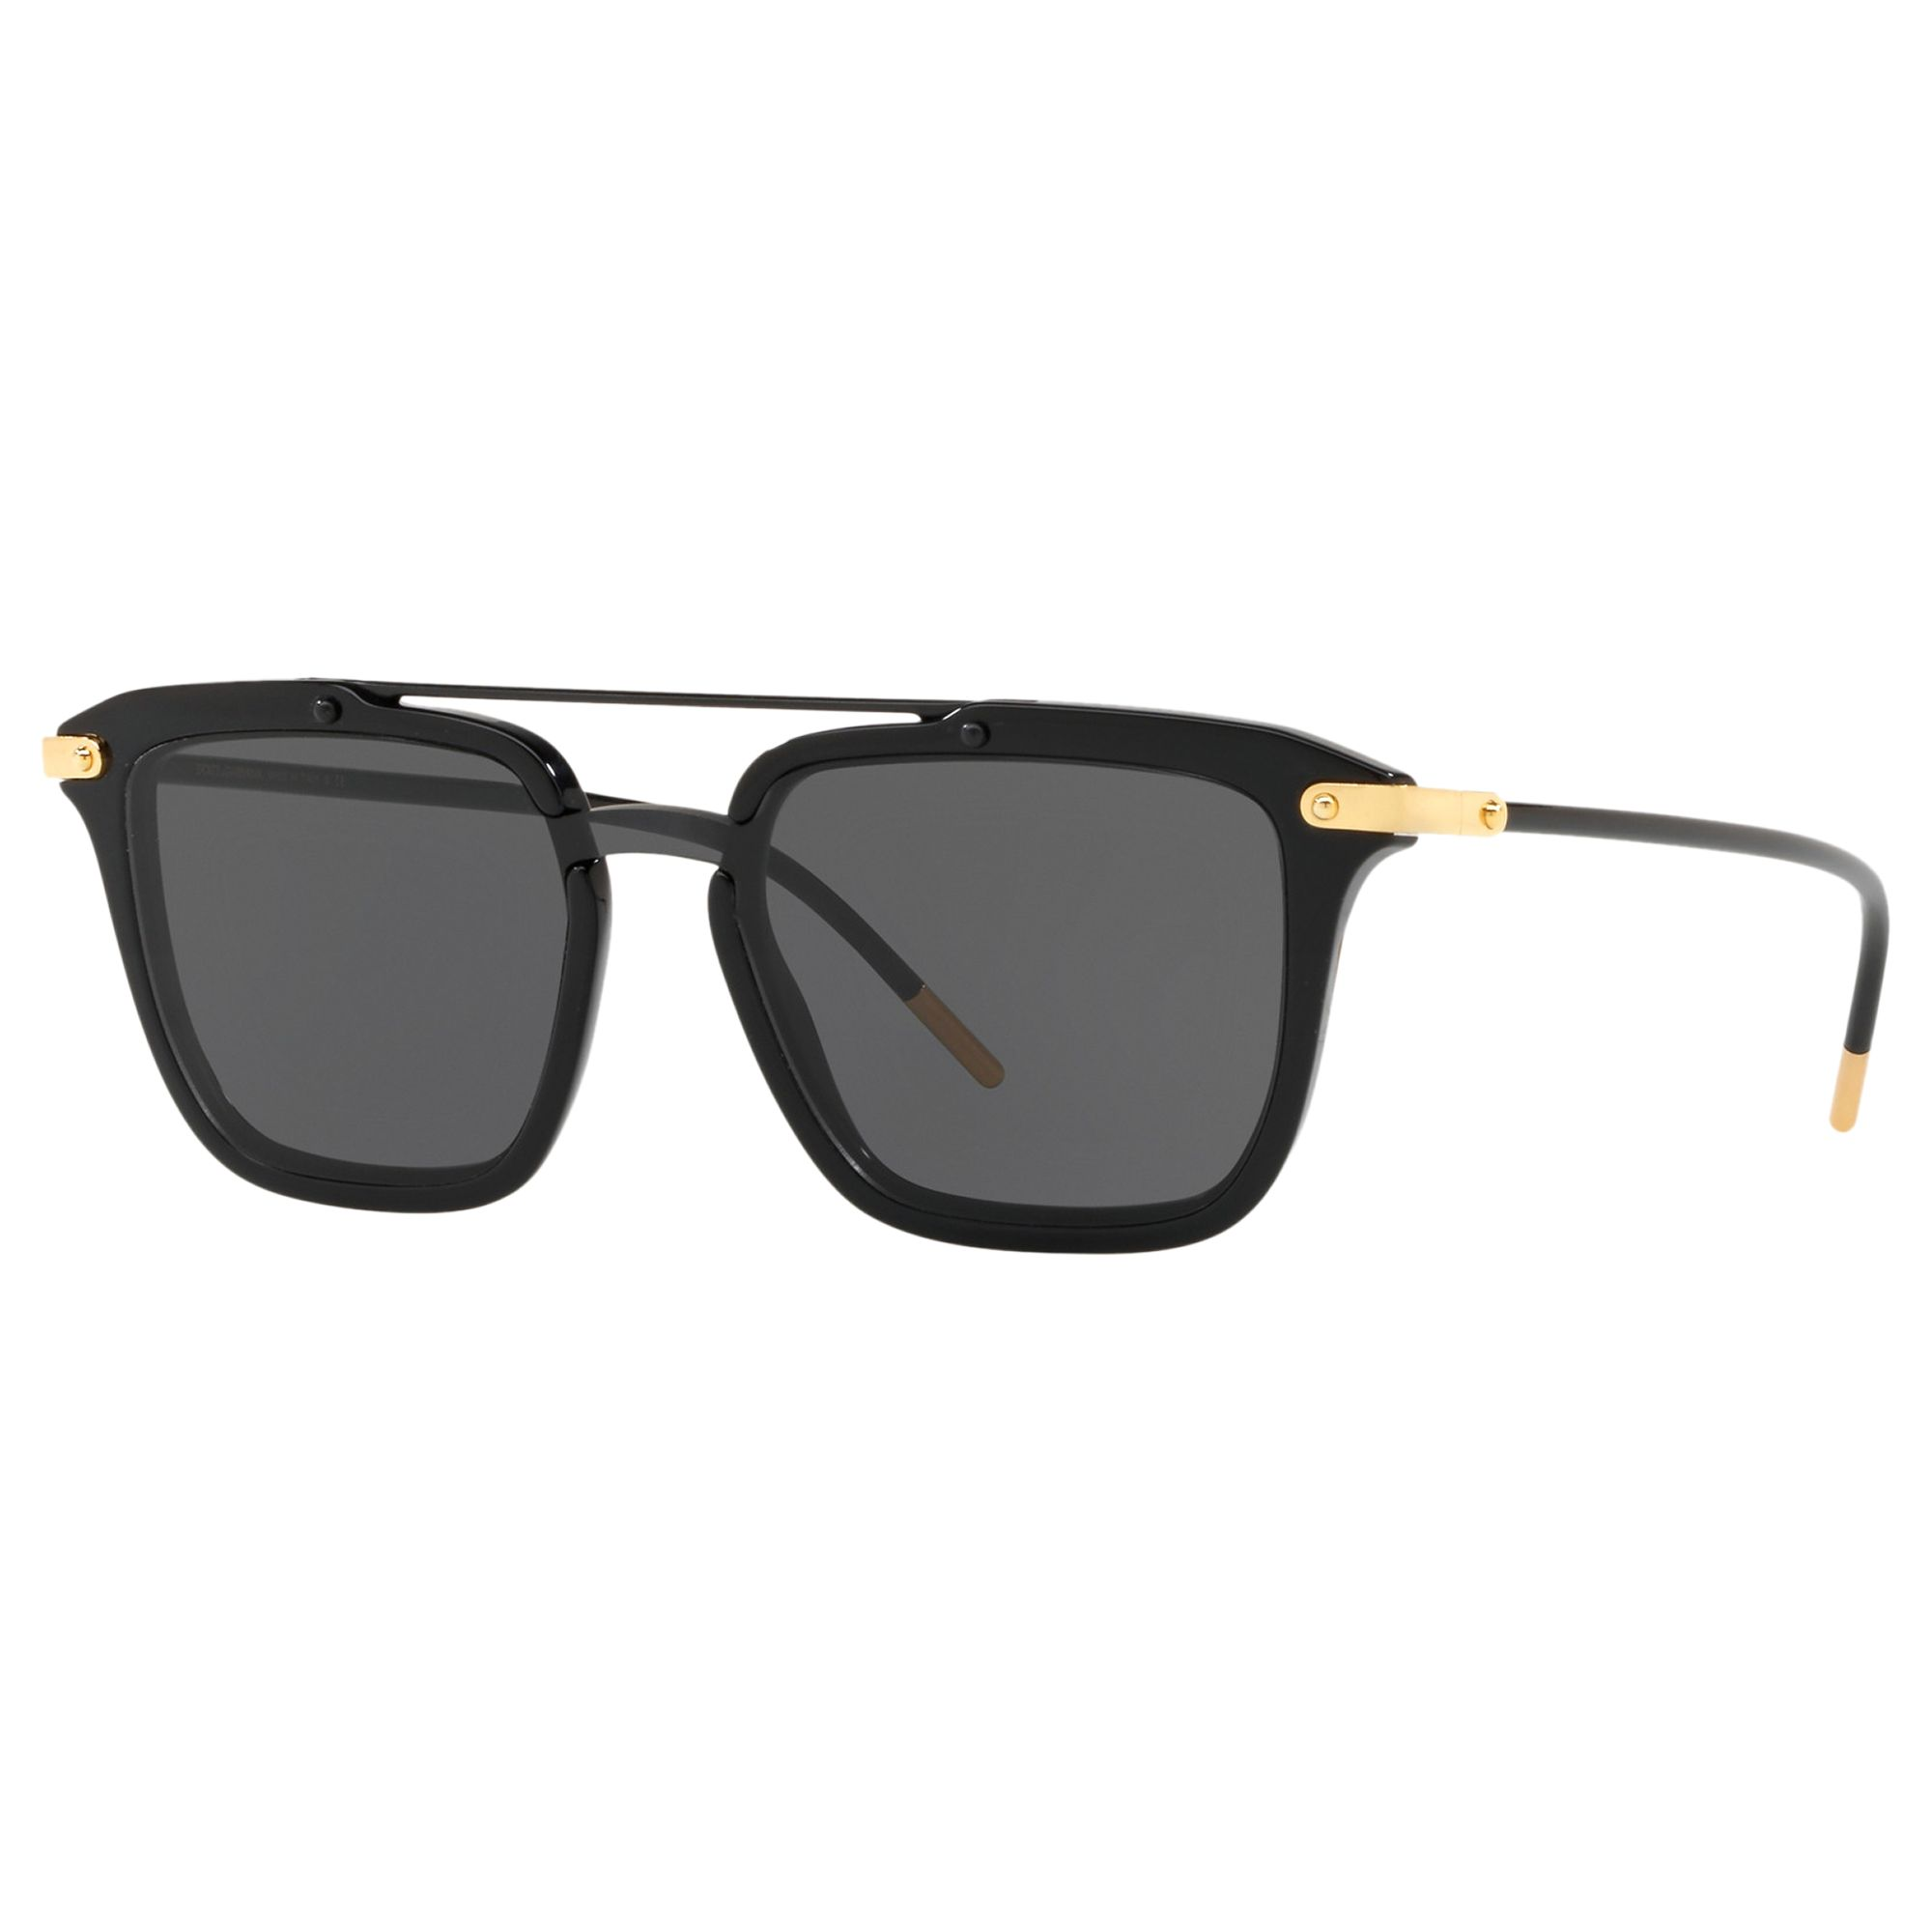 Dolce & Gabbana Dolce & Gabbana D4327 Women's Square Polarised Sunglasses, Black/Grey